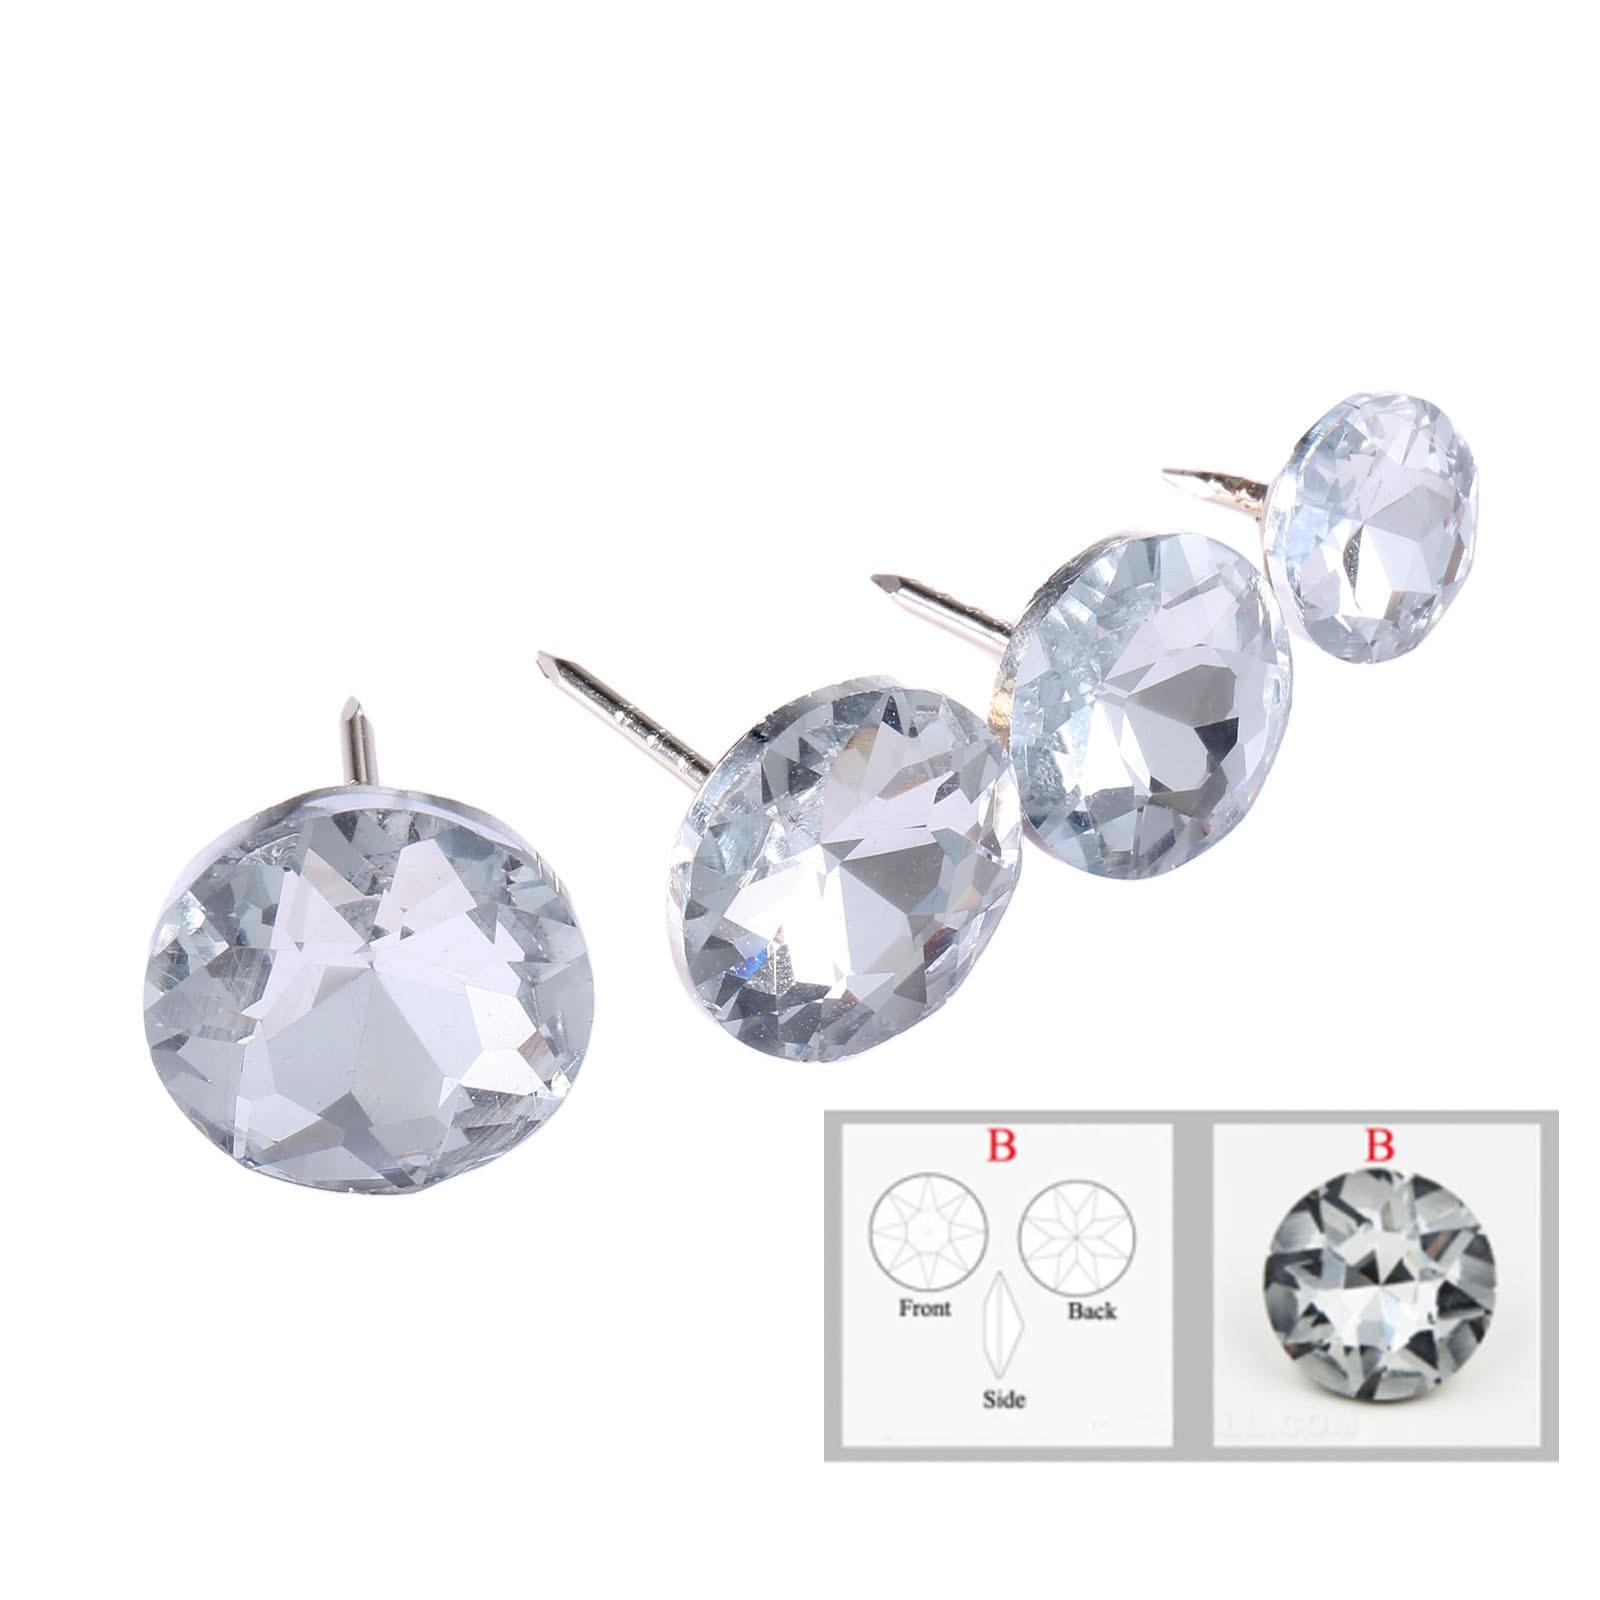 50pcs Crystal Diamond Upholstery Sofa Wall Headboard Buttons Nail 20mm 22mm